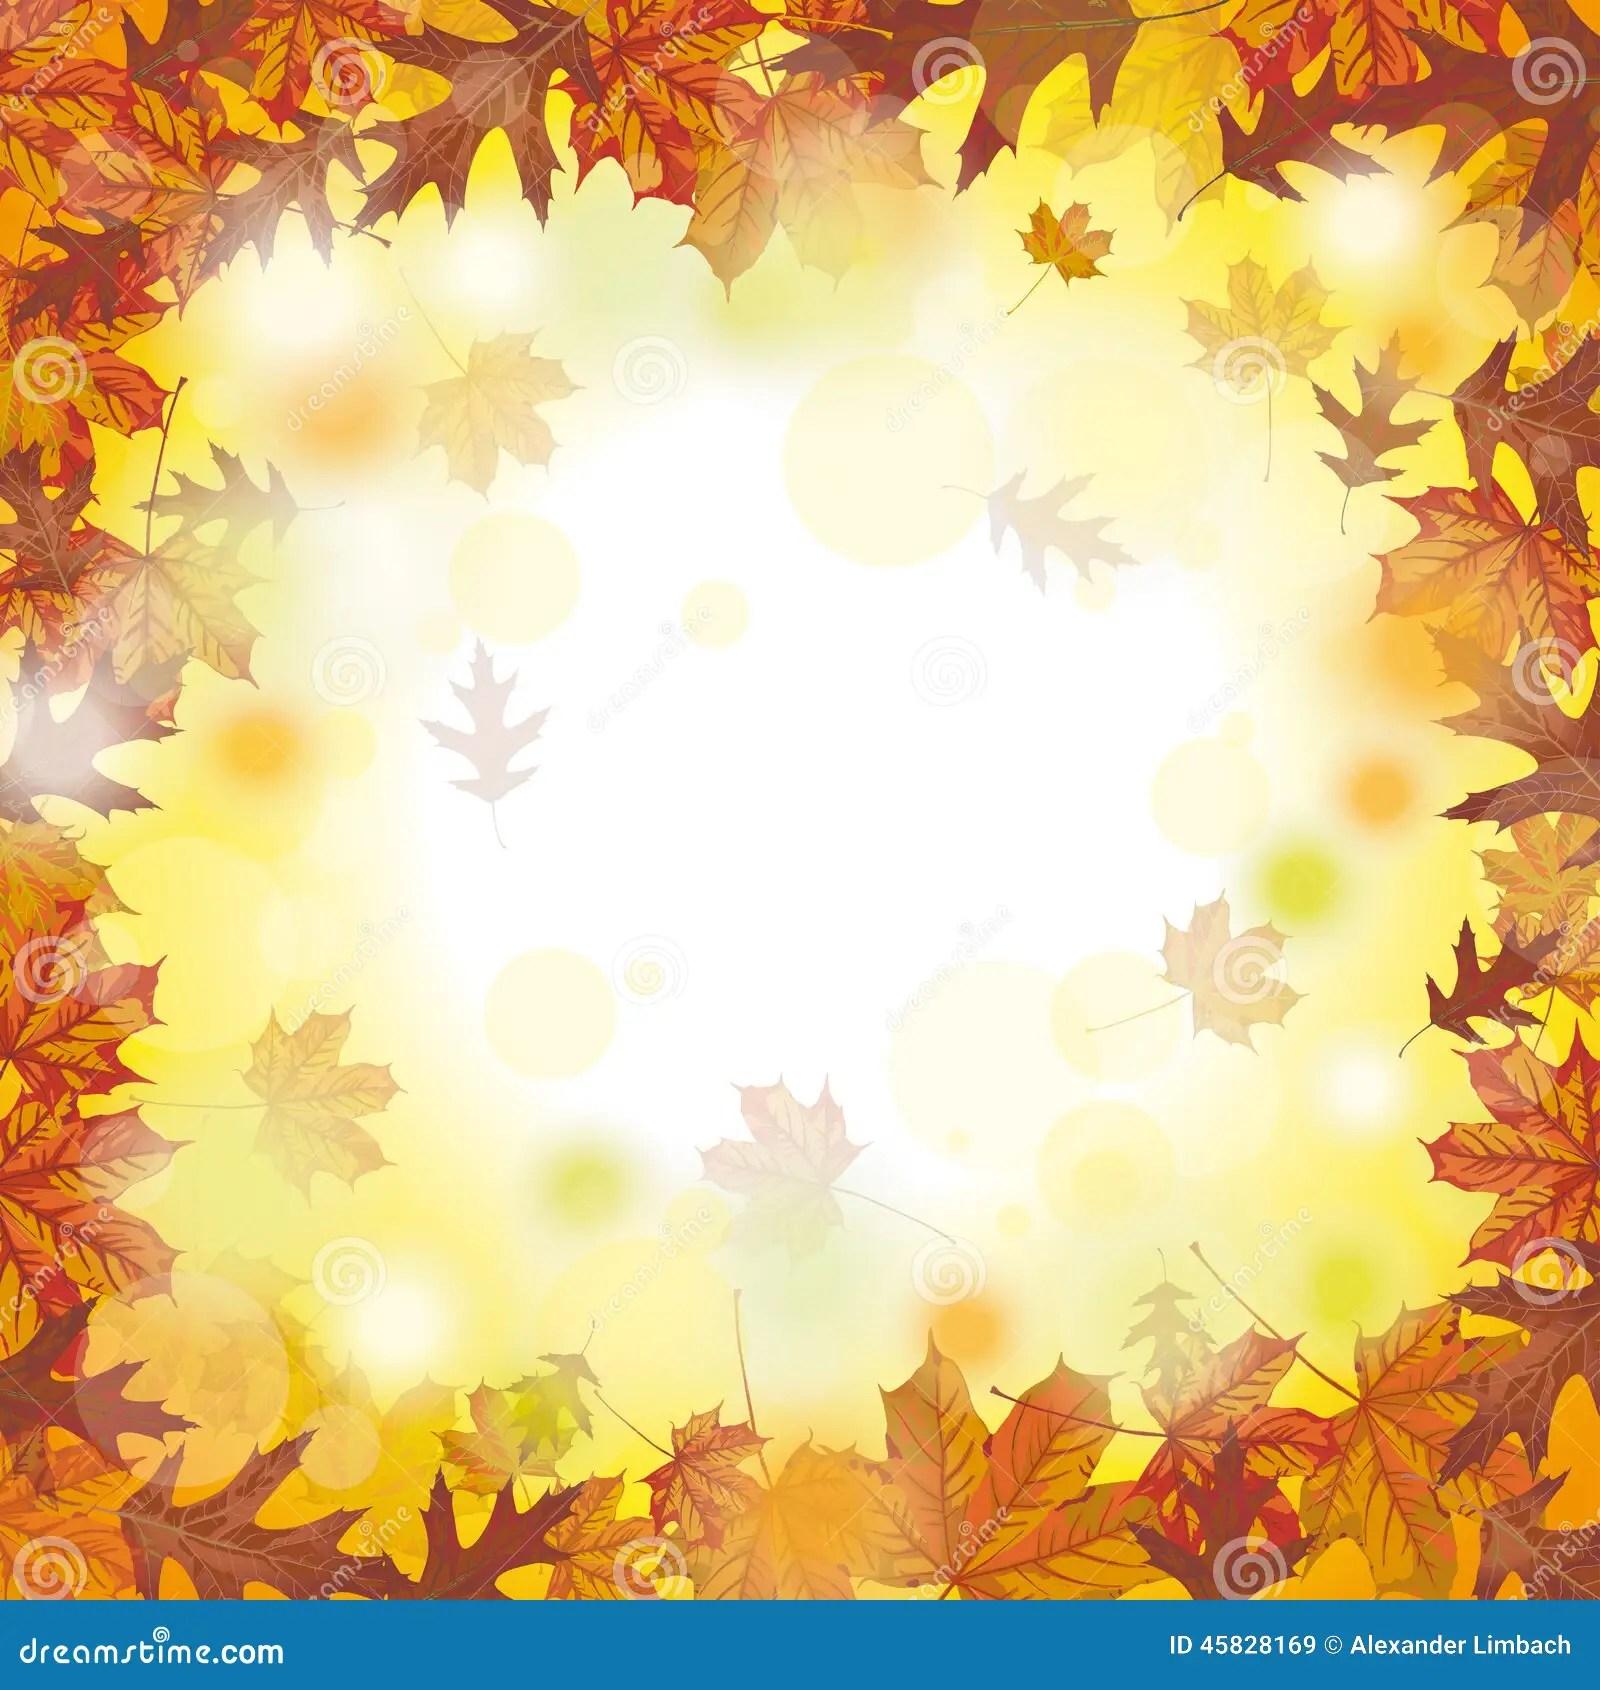 Fall Harvest Wallpaper Christian Outside Autumn Foliage Fall Stock Vector Illustration Of